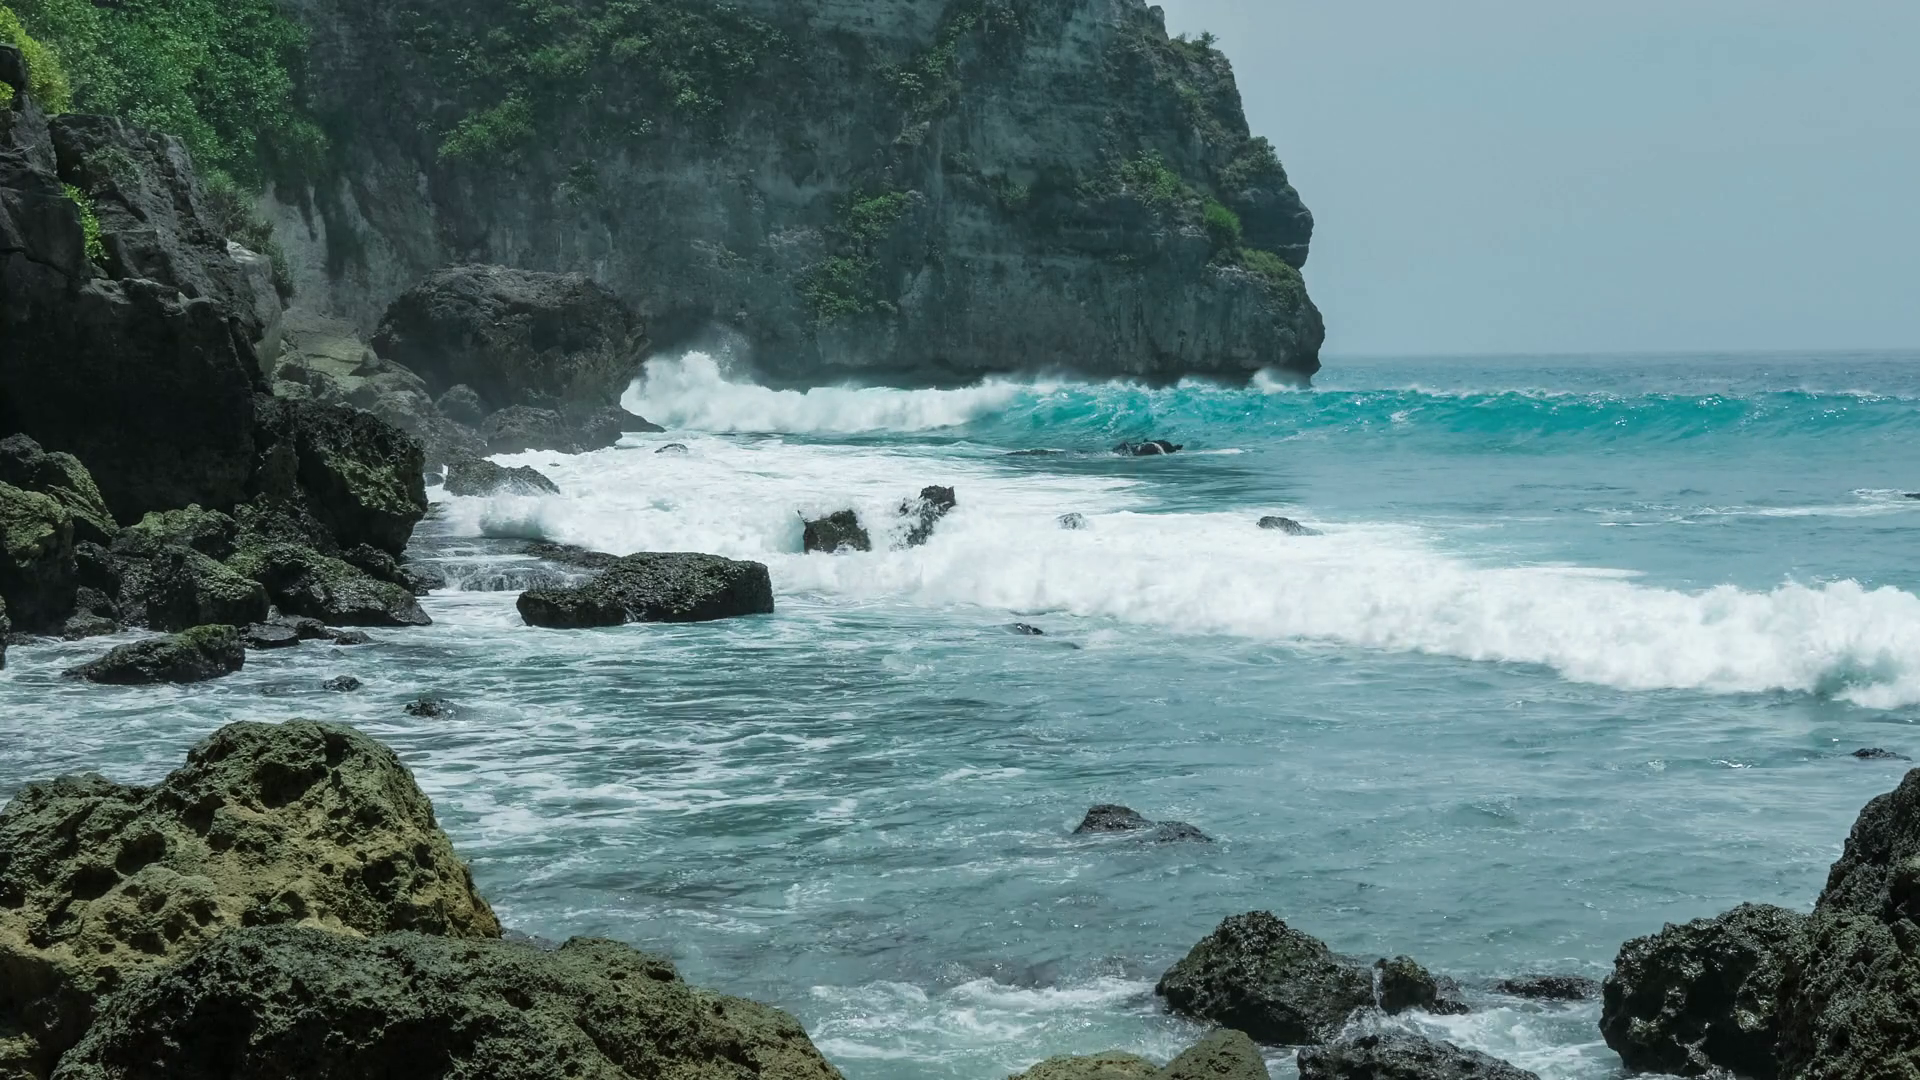 videoblocks-ocean-waves-hitting-tembeling-coastline-at-nusa-penida-island-bali-indonesia_saxurmkg1w_thumbnail-full01[1]